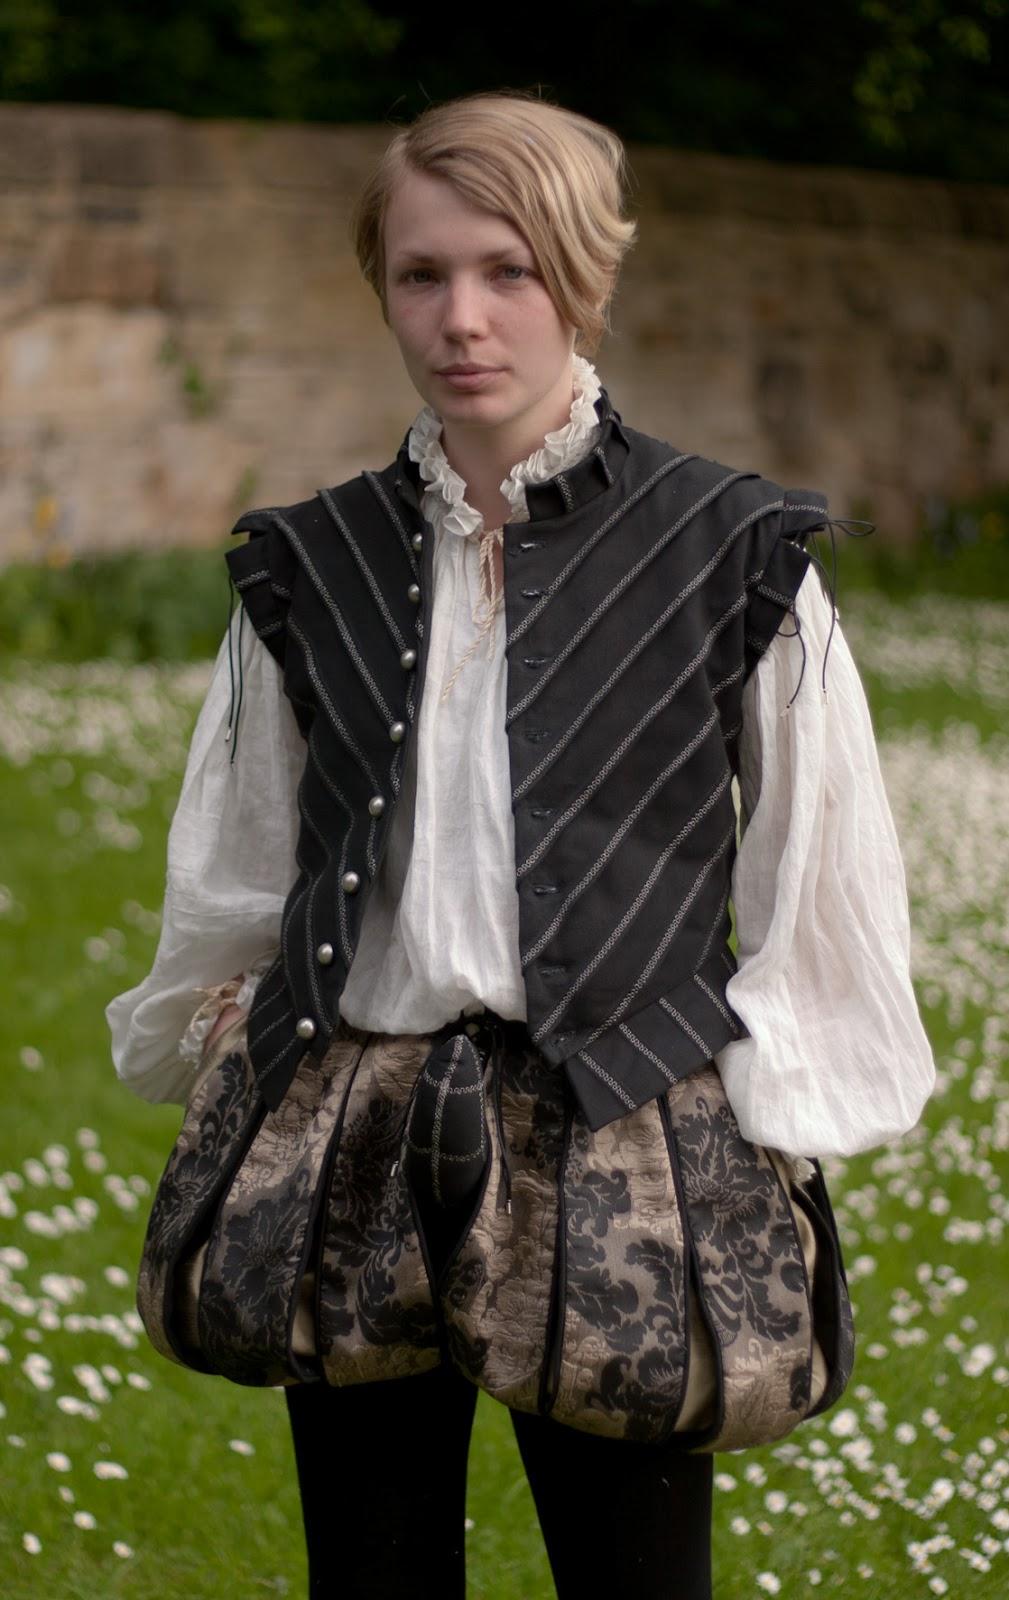 14001500 in European fashion - Wikipedia 100